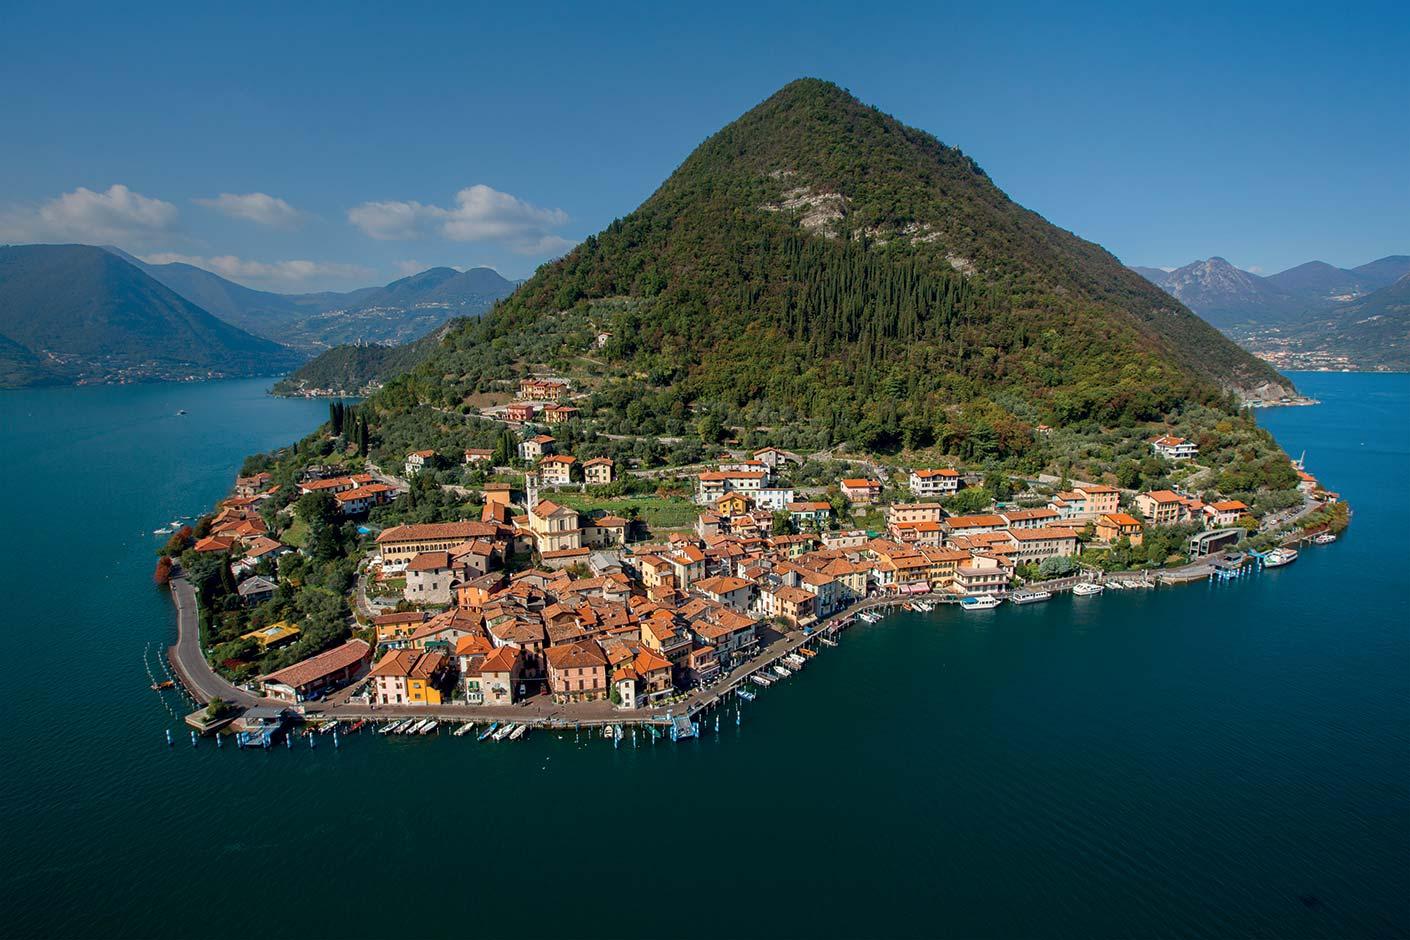 montisola-najvece-jezero-u-evropi-secret-world